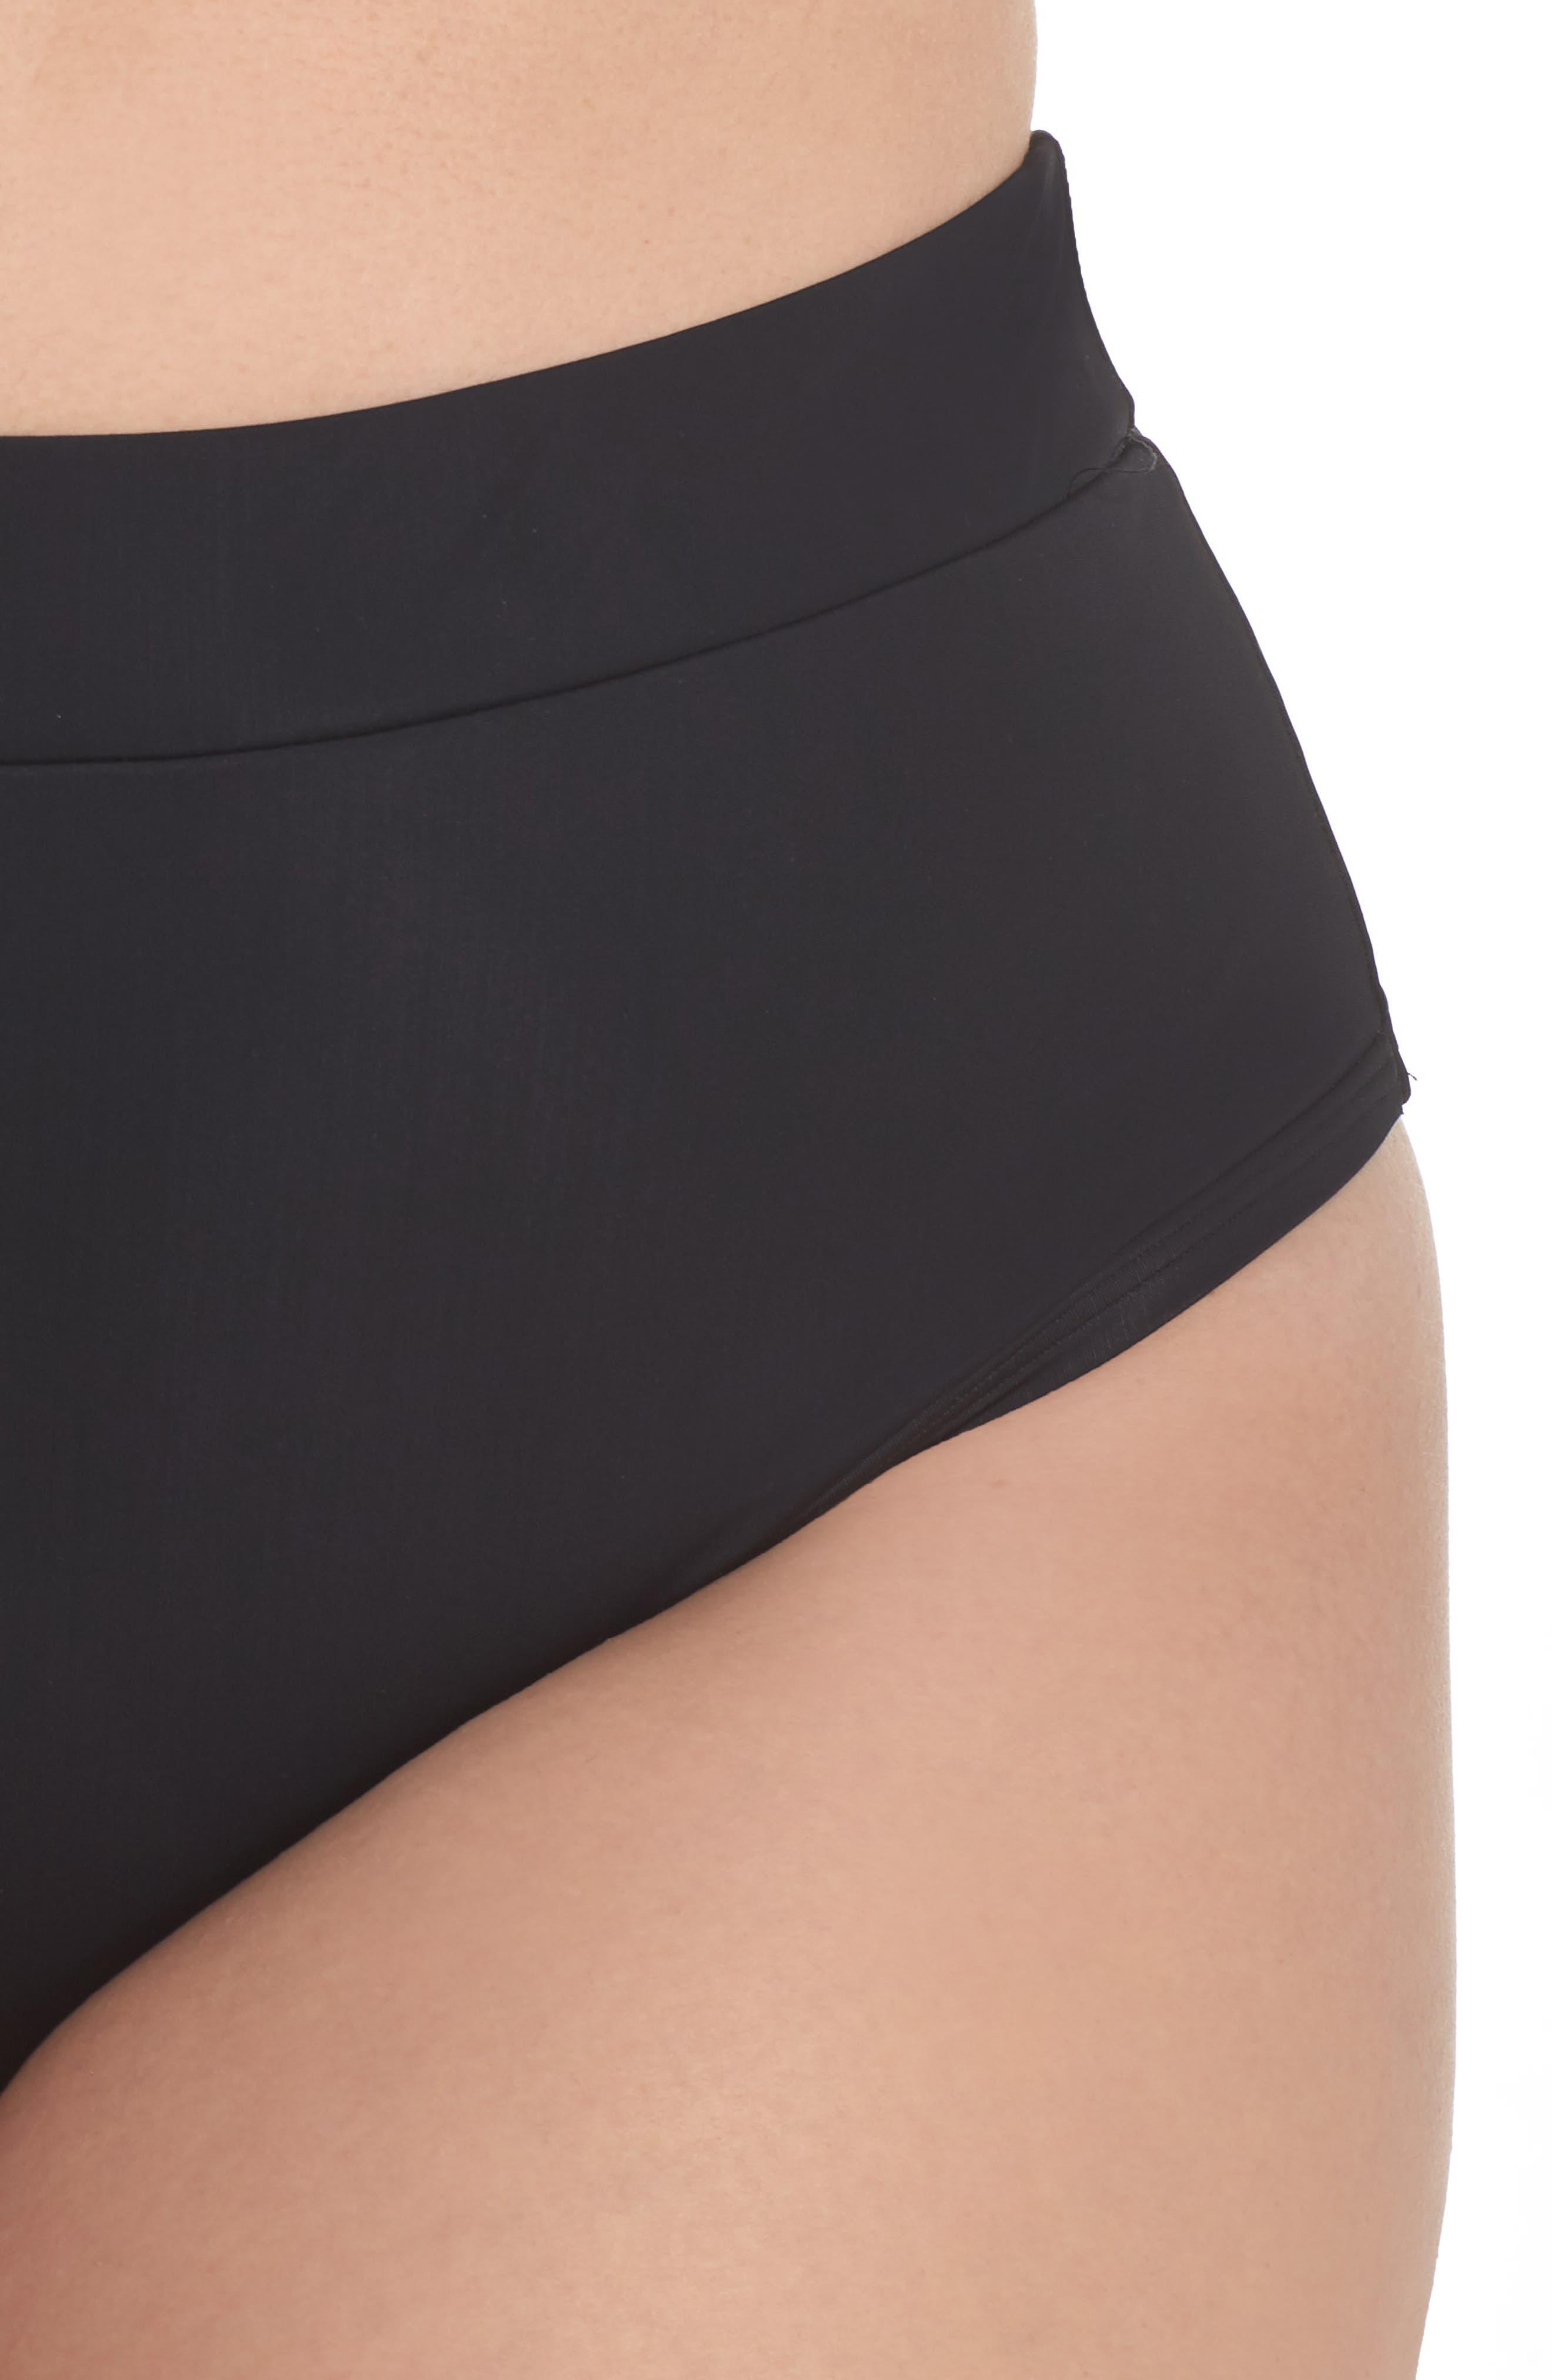 Lover High Waist Bikini Bottoms,                             Alternate thumbnail 4, color,                             BLACK